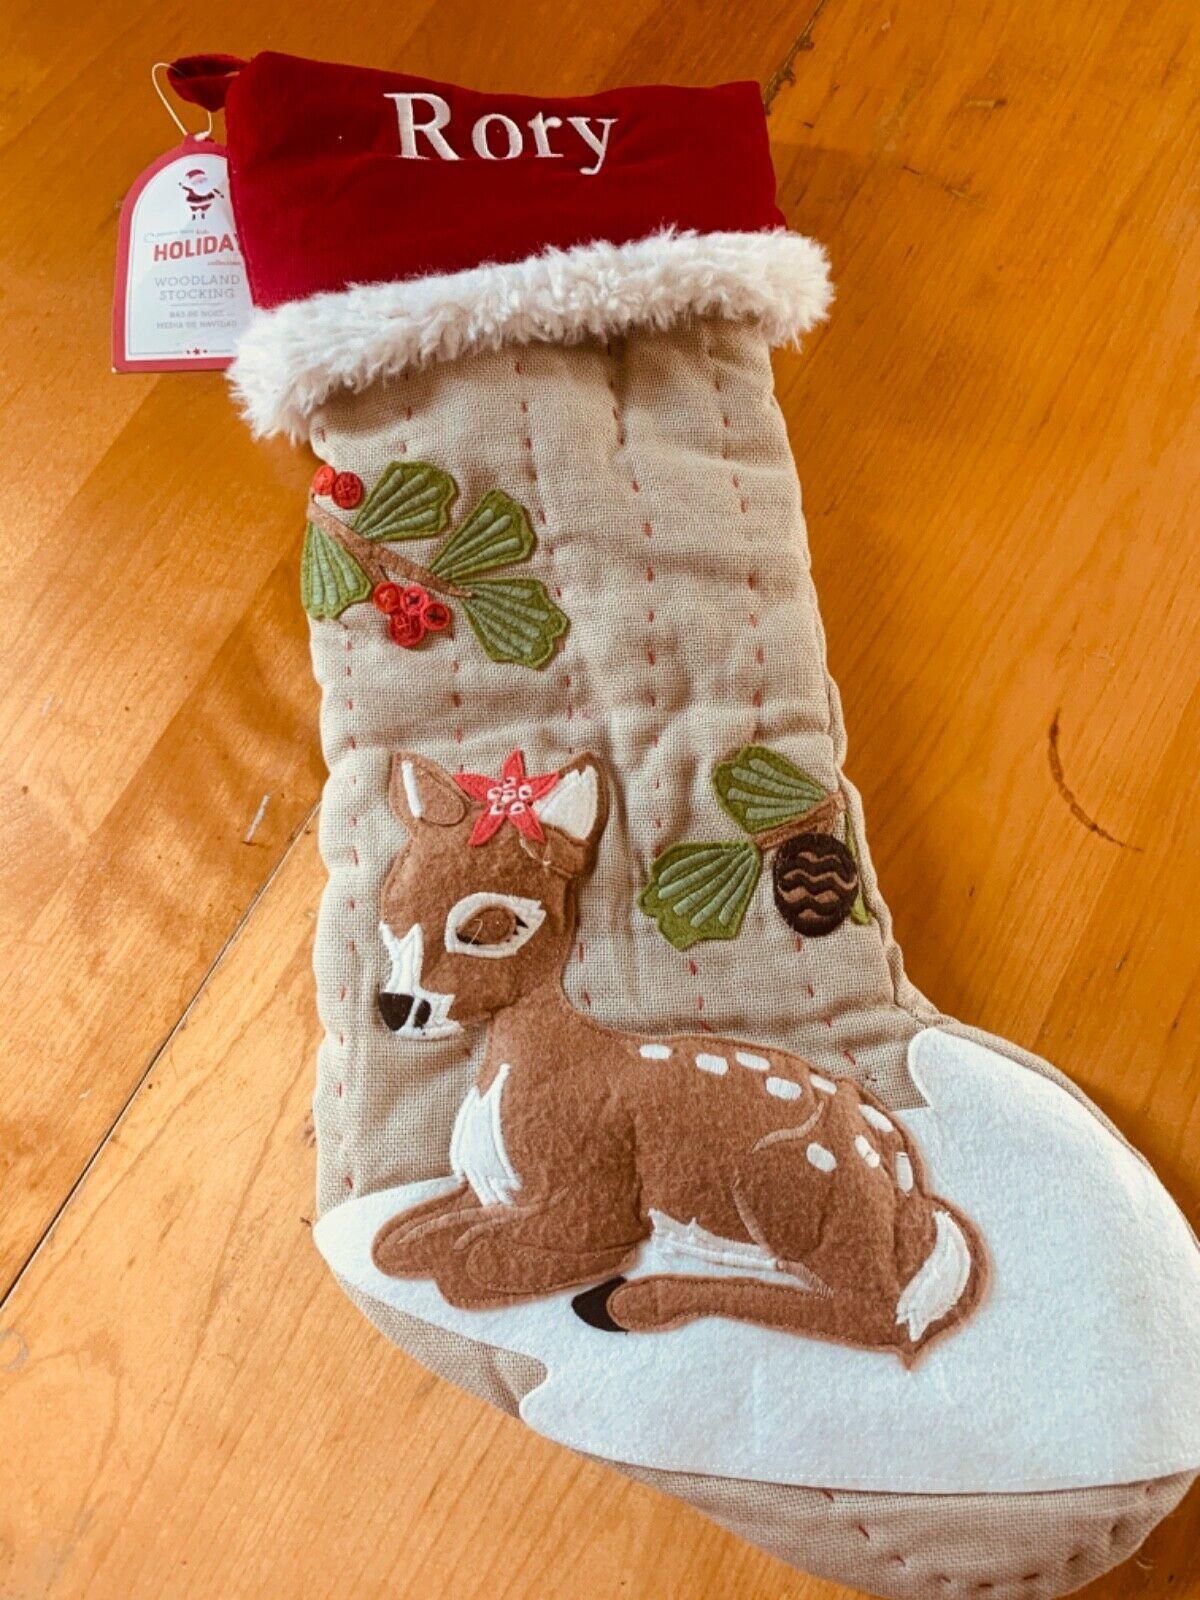 Nwt Pottery Barn Kids Christmas Stocking Woodland Girl Deer Rory Potterybarnkids C Kids Christmas Stockings Christmas Stockings Burlap Christmas Stockings